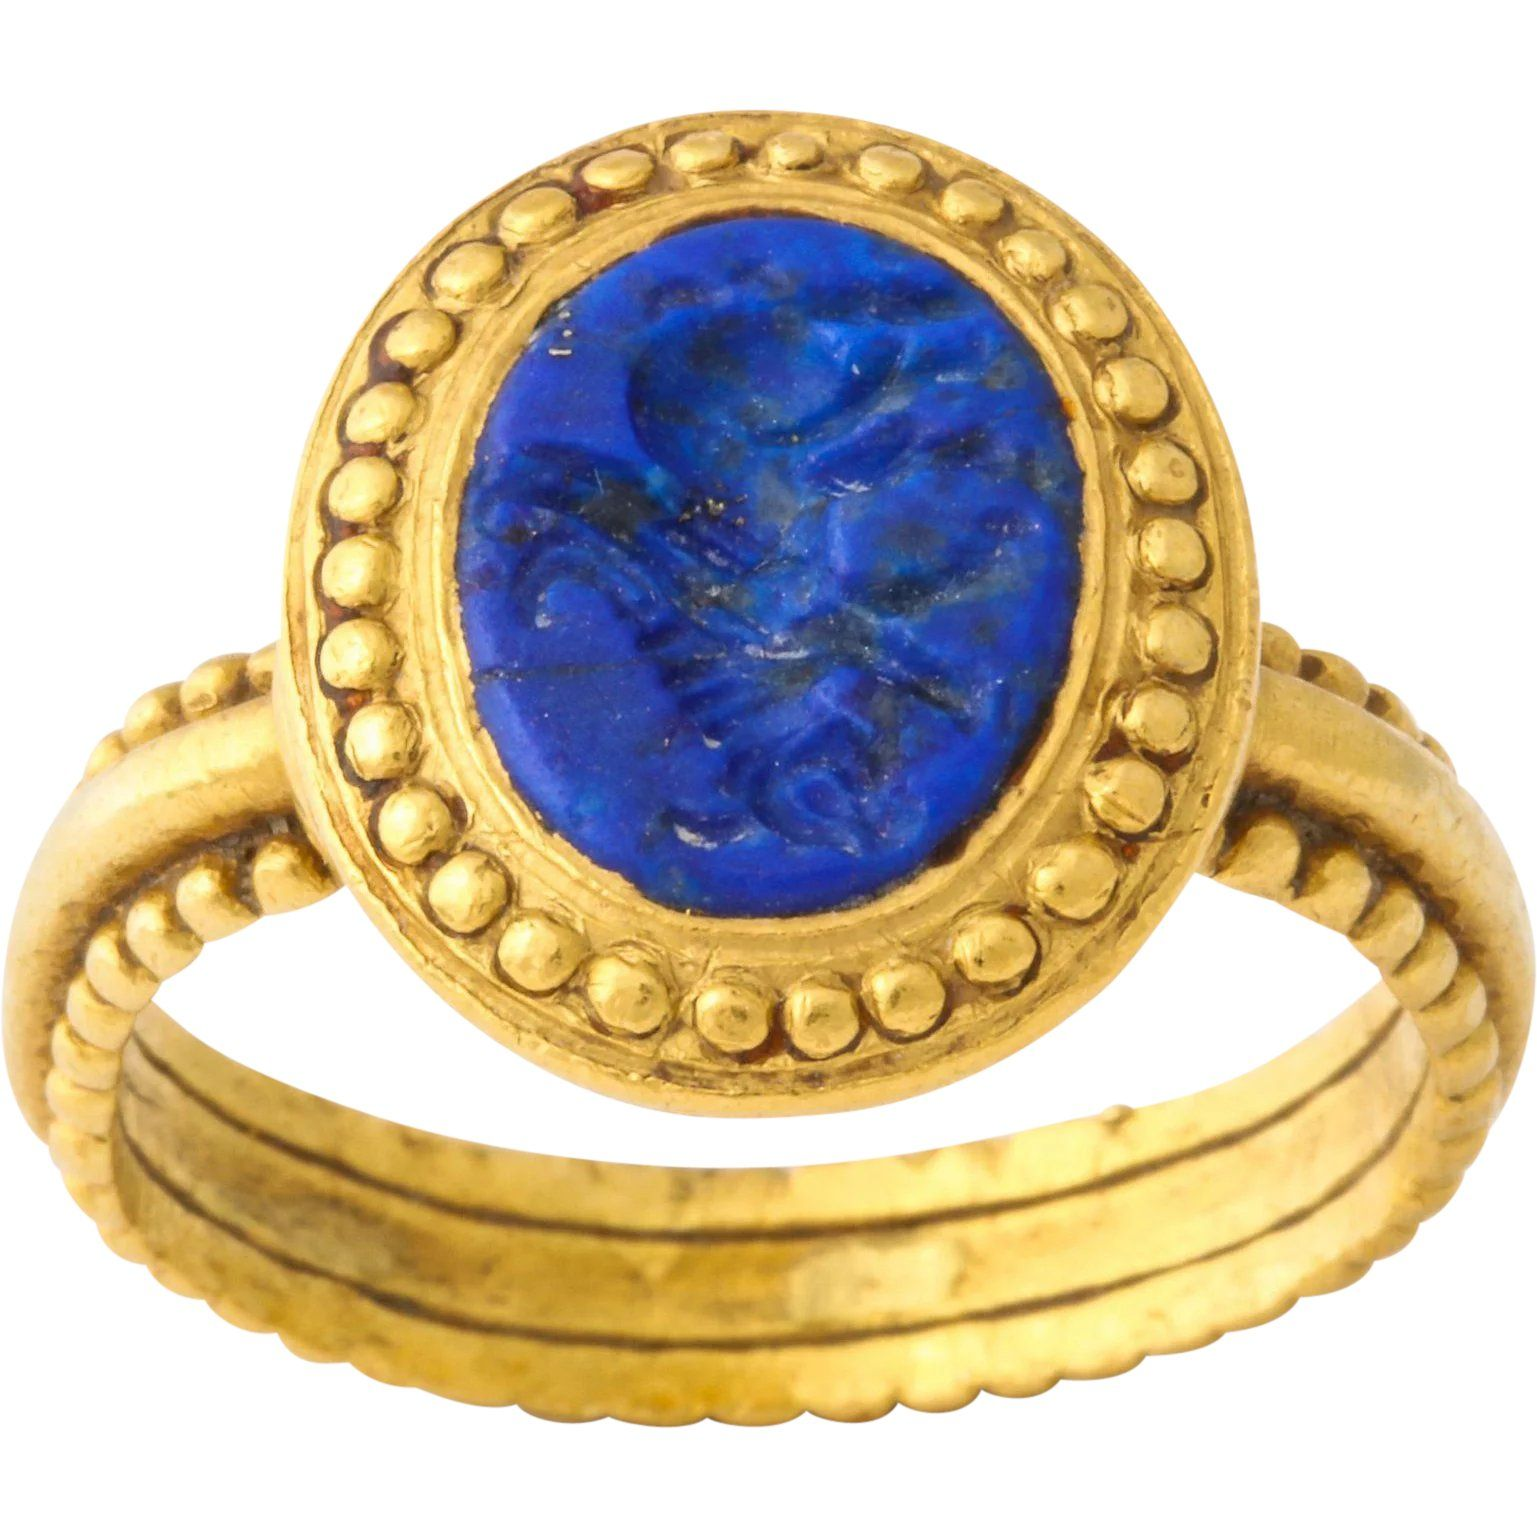 Ancient Roman Sassanian Lapis Intaglio Ring, circa 600 AD